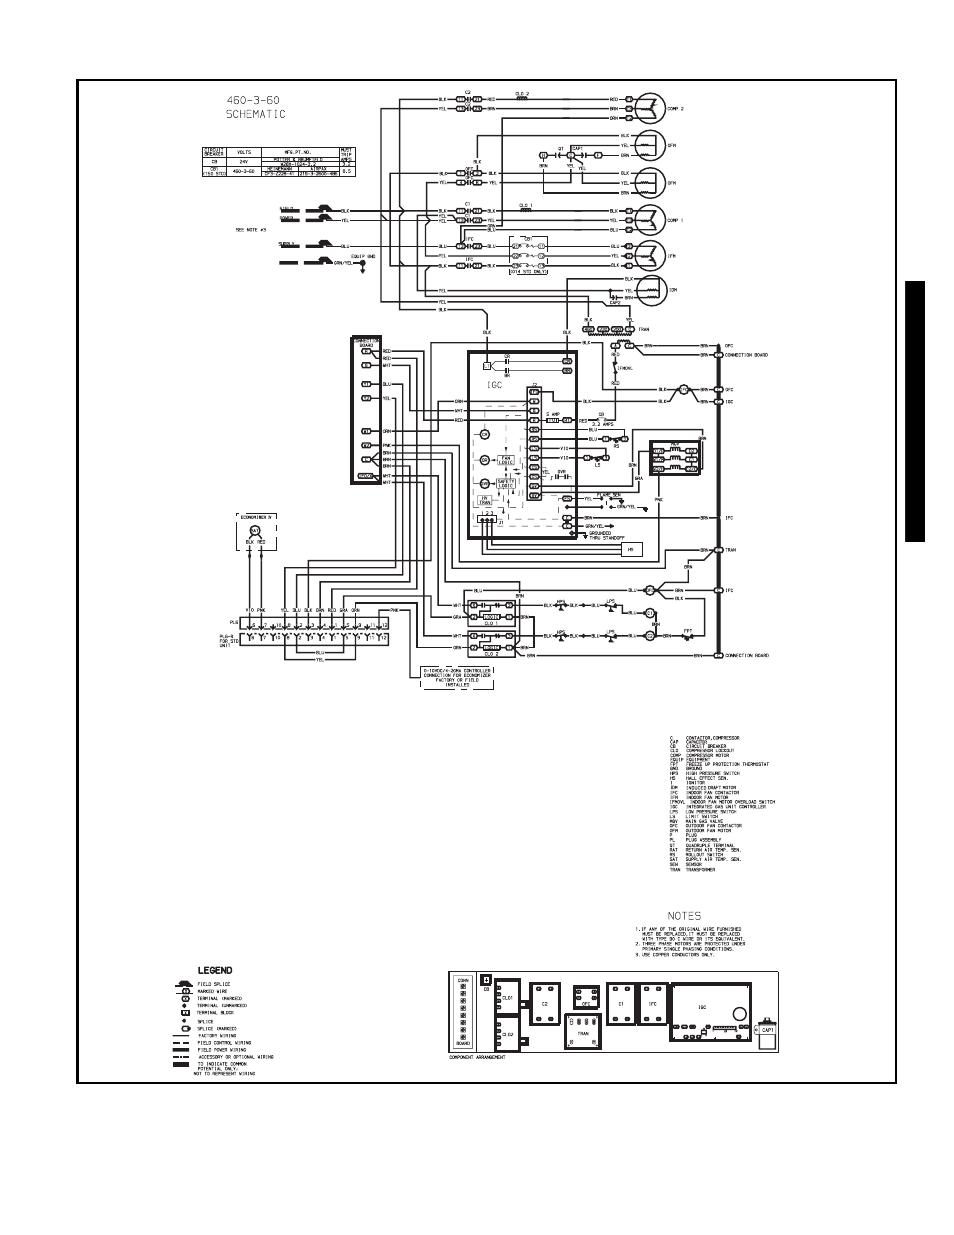 medium resolution of typical wiring schematics bryant 581c user manual page 139 298